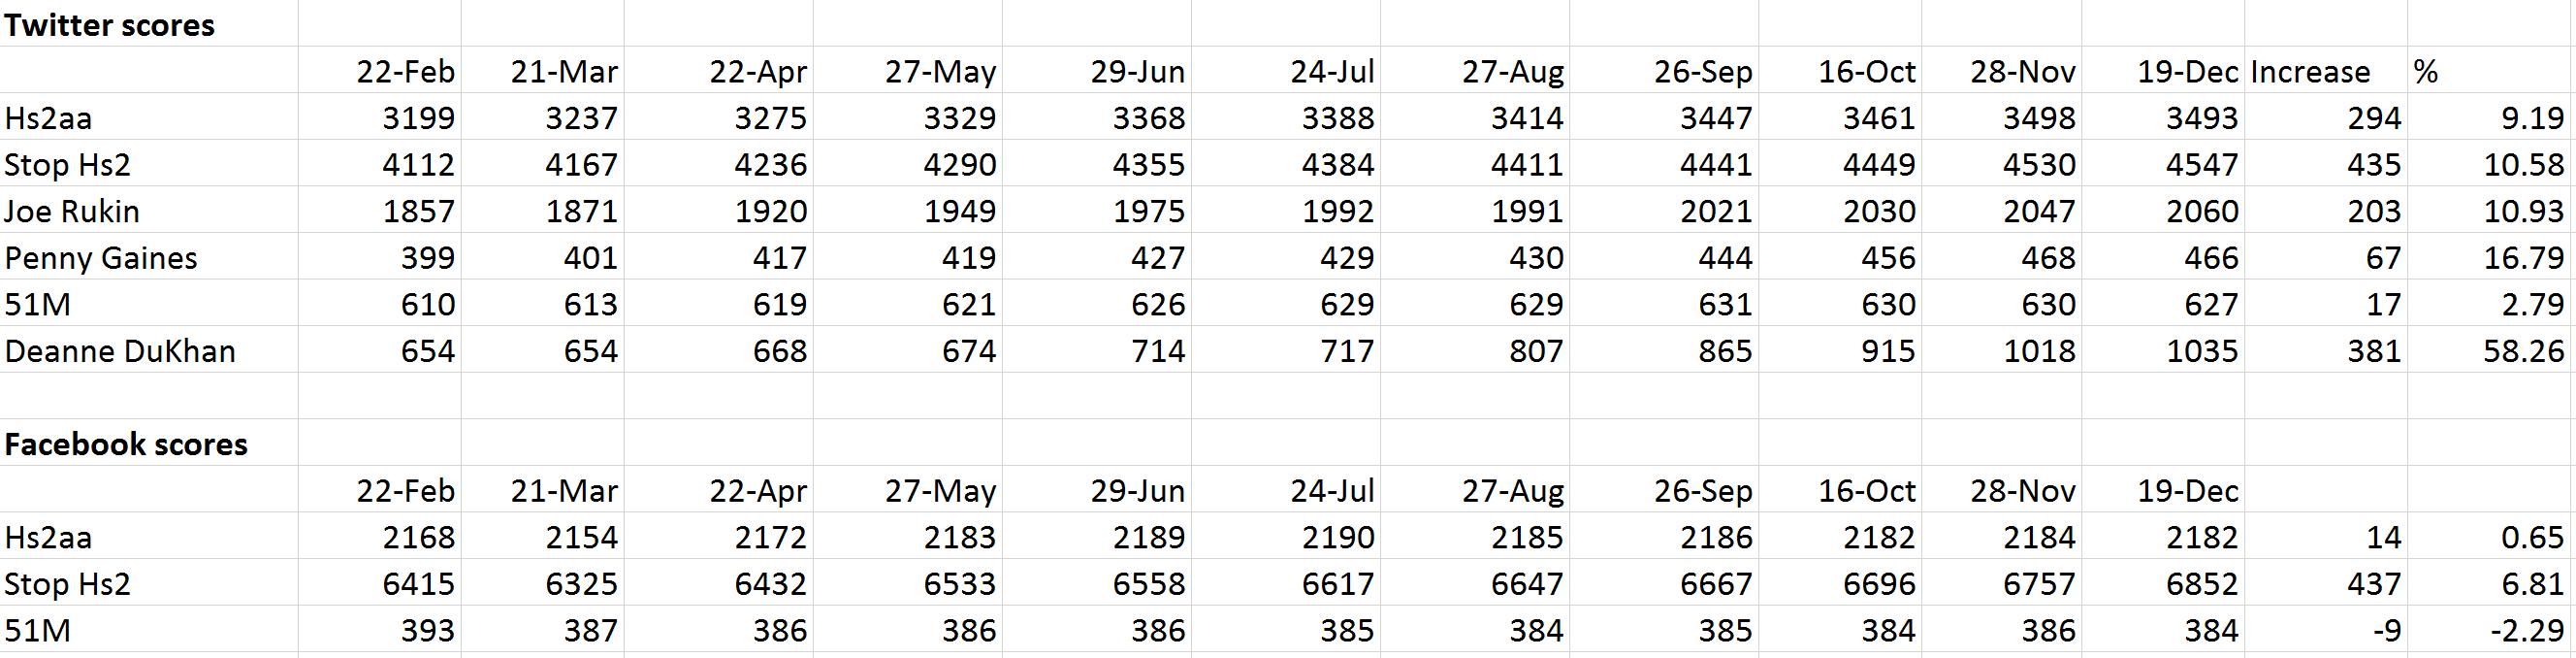 anti Hs2 stats Dec 2015